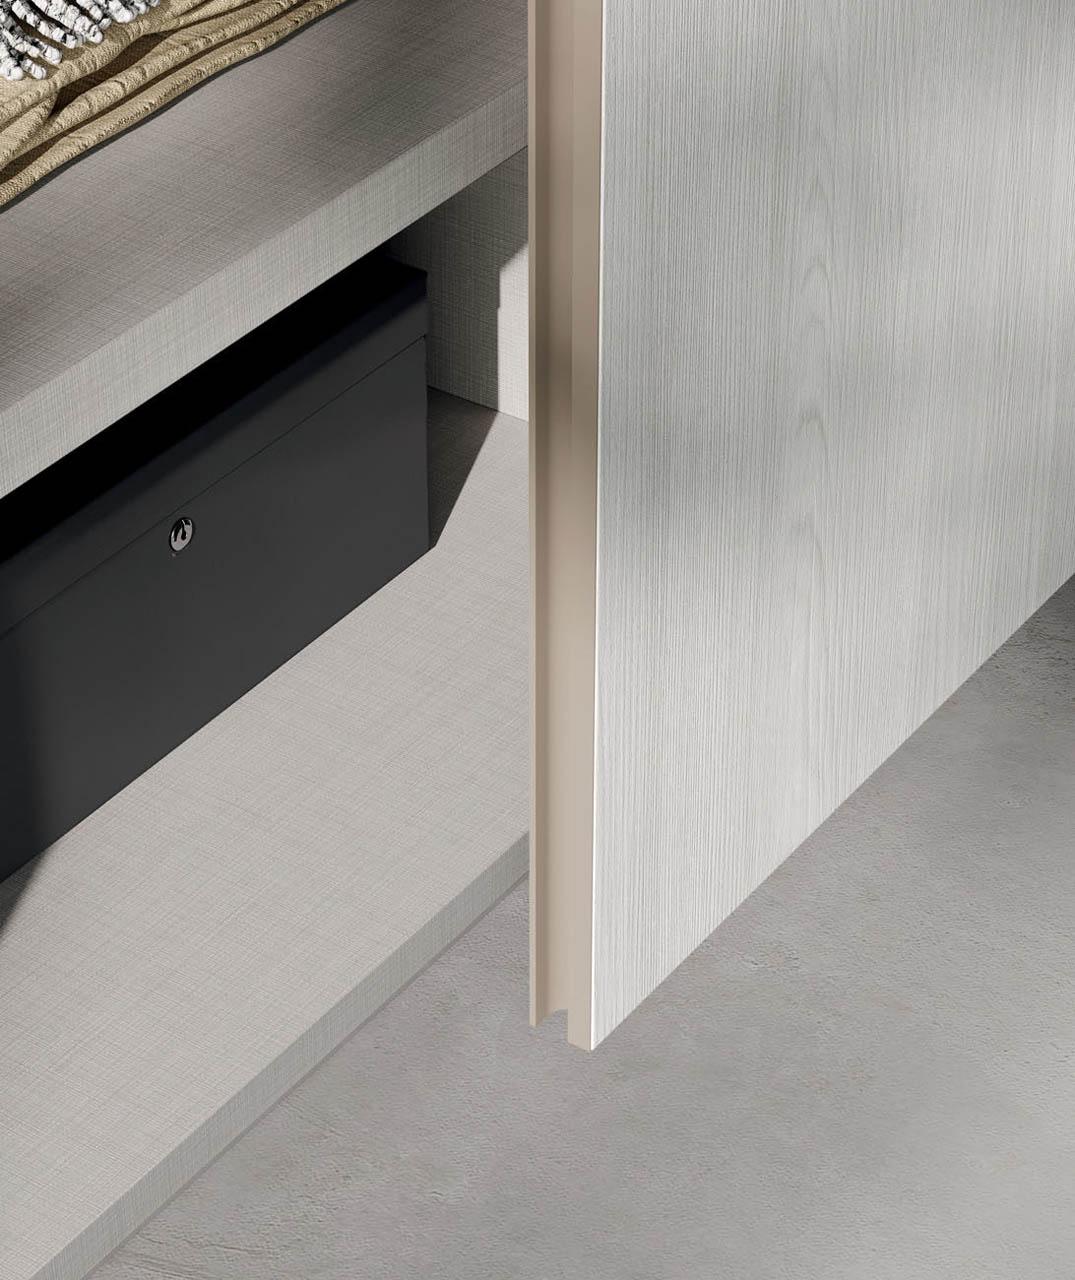 armadio-scorrevole-anta-arka-2-orme-1092x1300